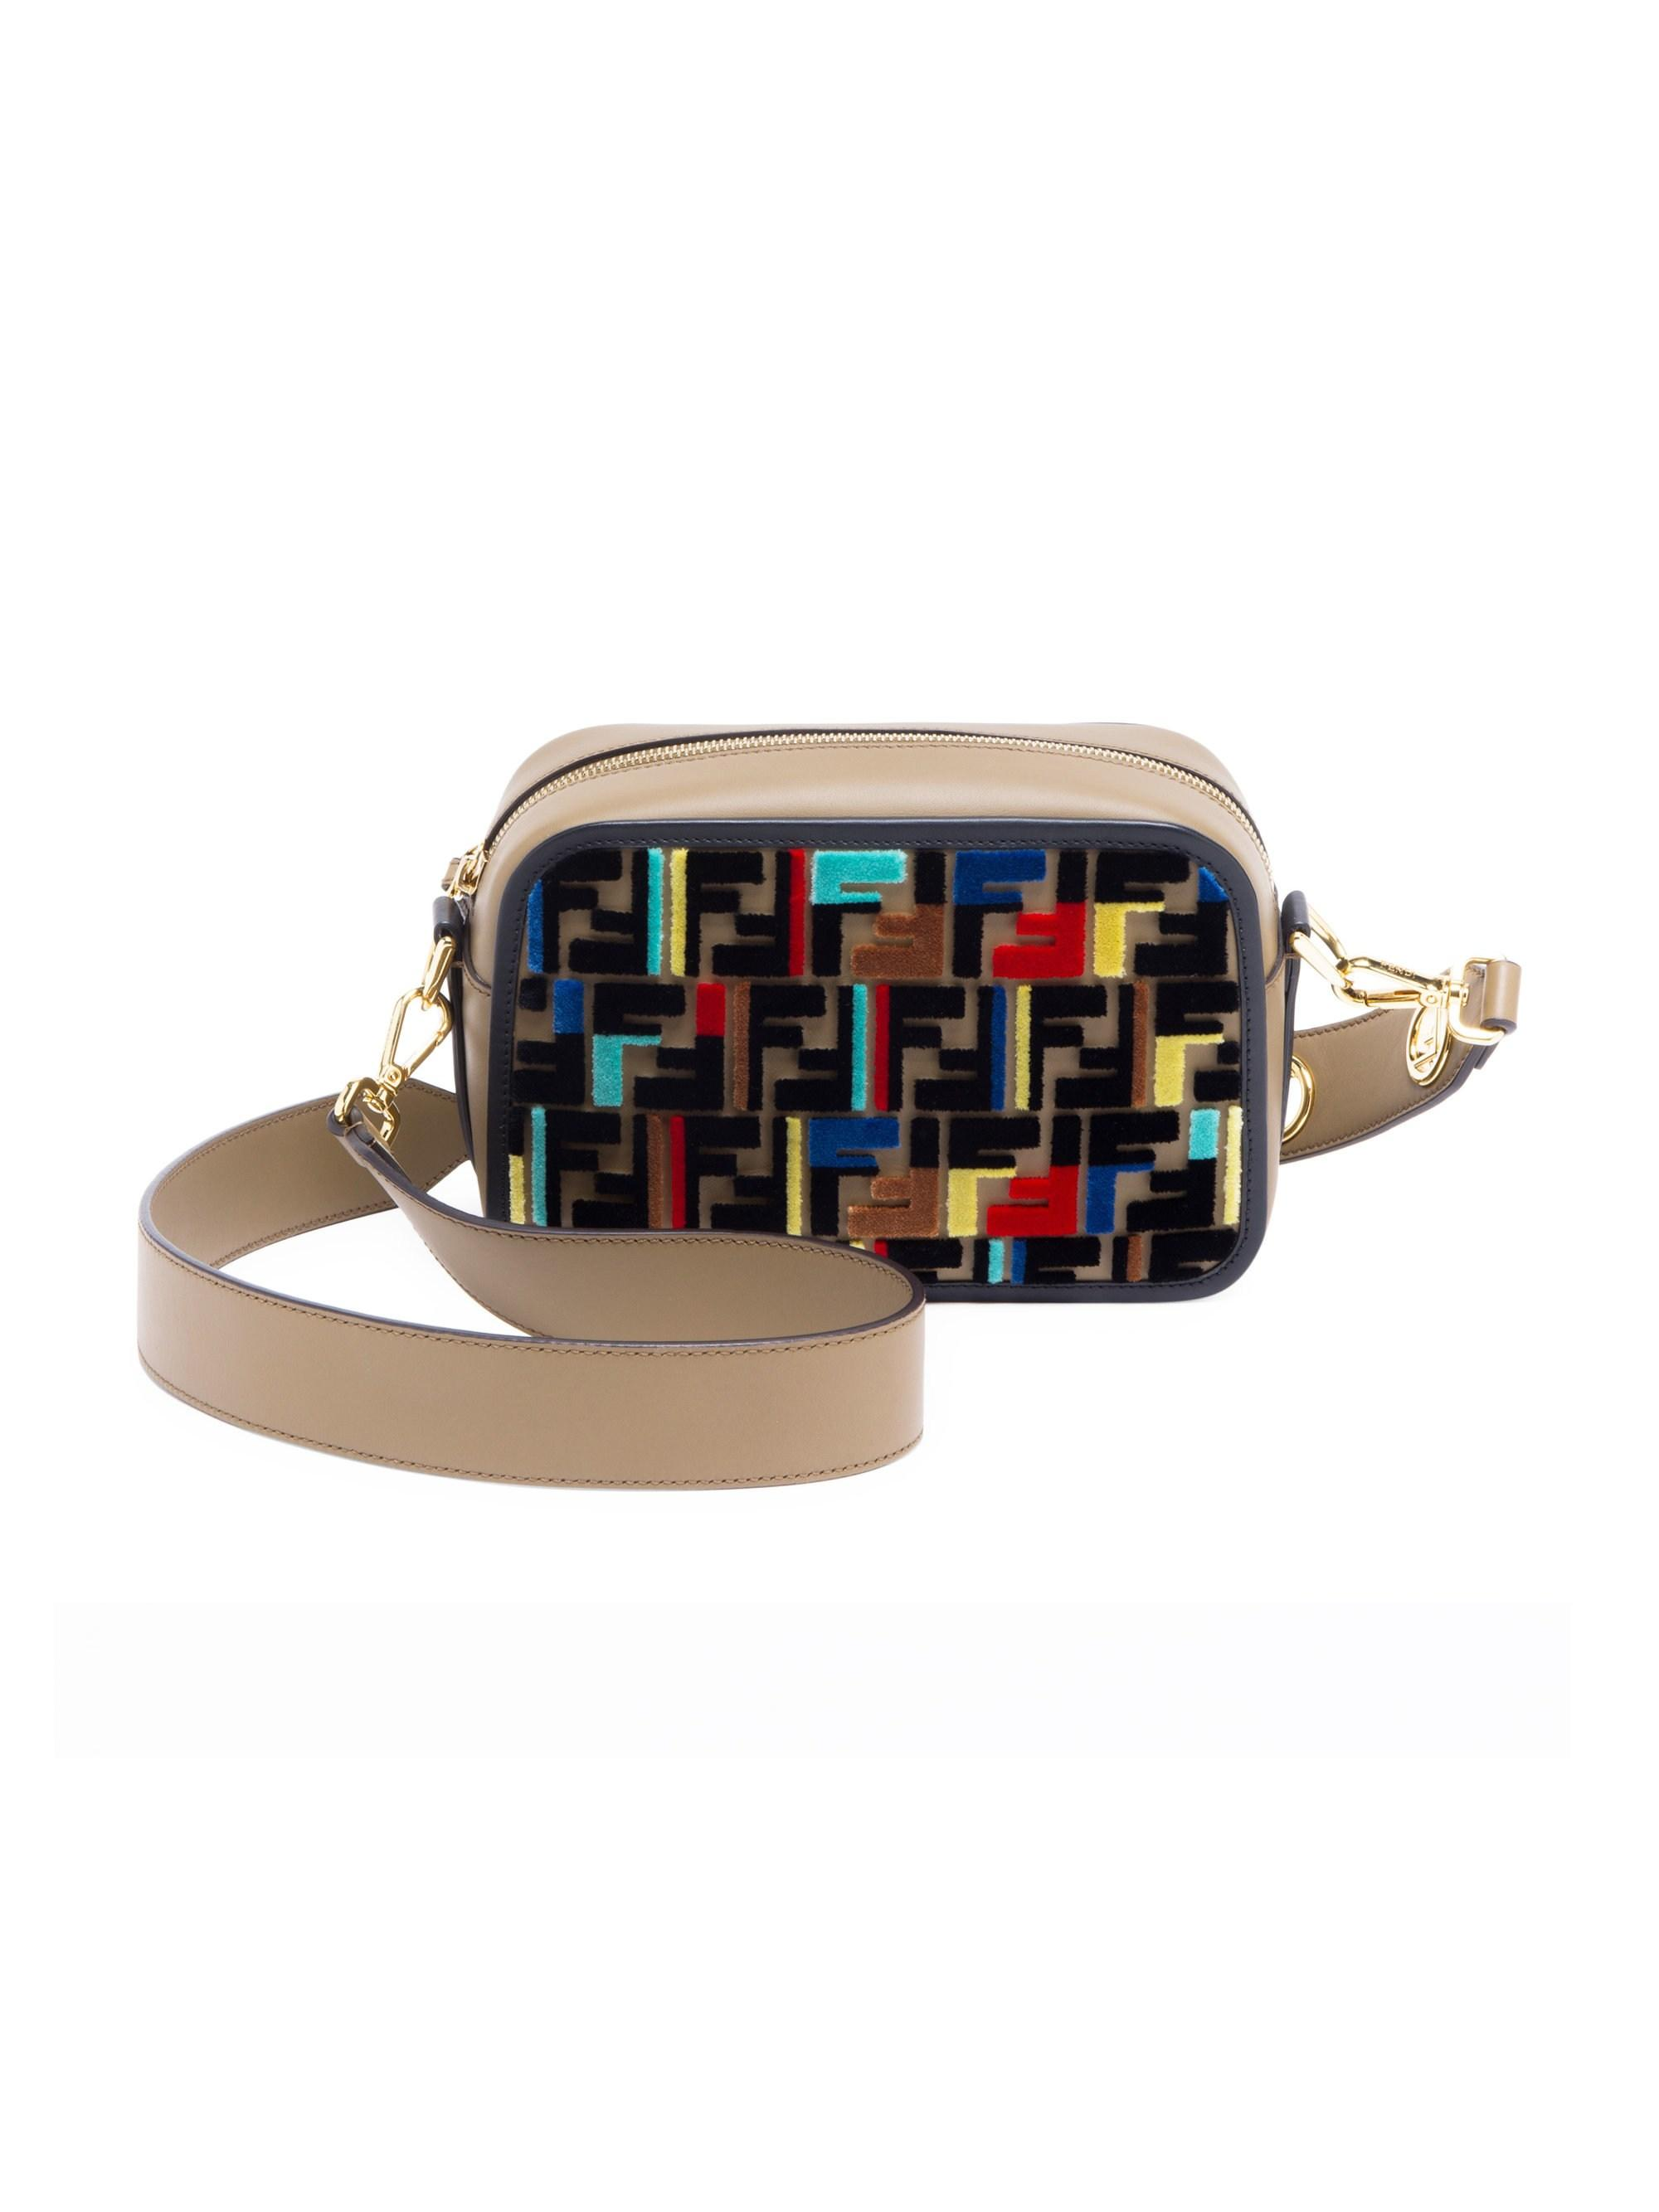 5cbe228eebd5 Lyst - Fendi Women s Tappetino Embroidered Camera Bag